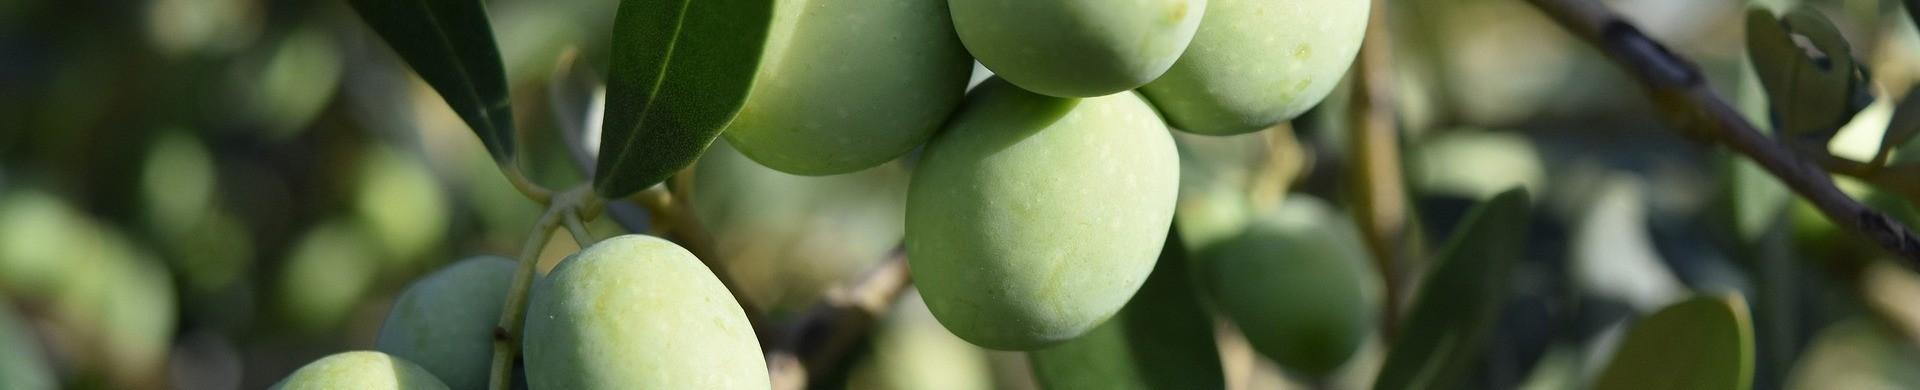 Olive Seedlings - Buy Cheap Olives